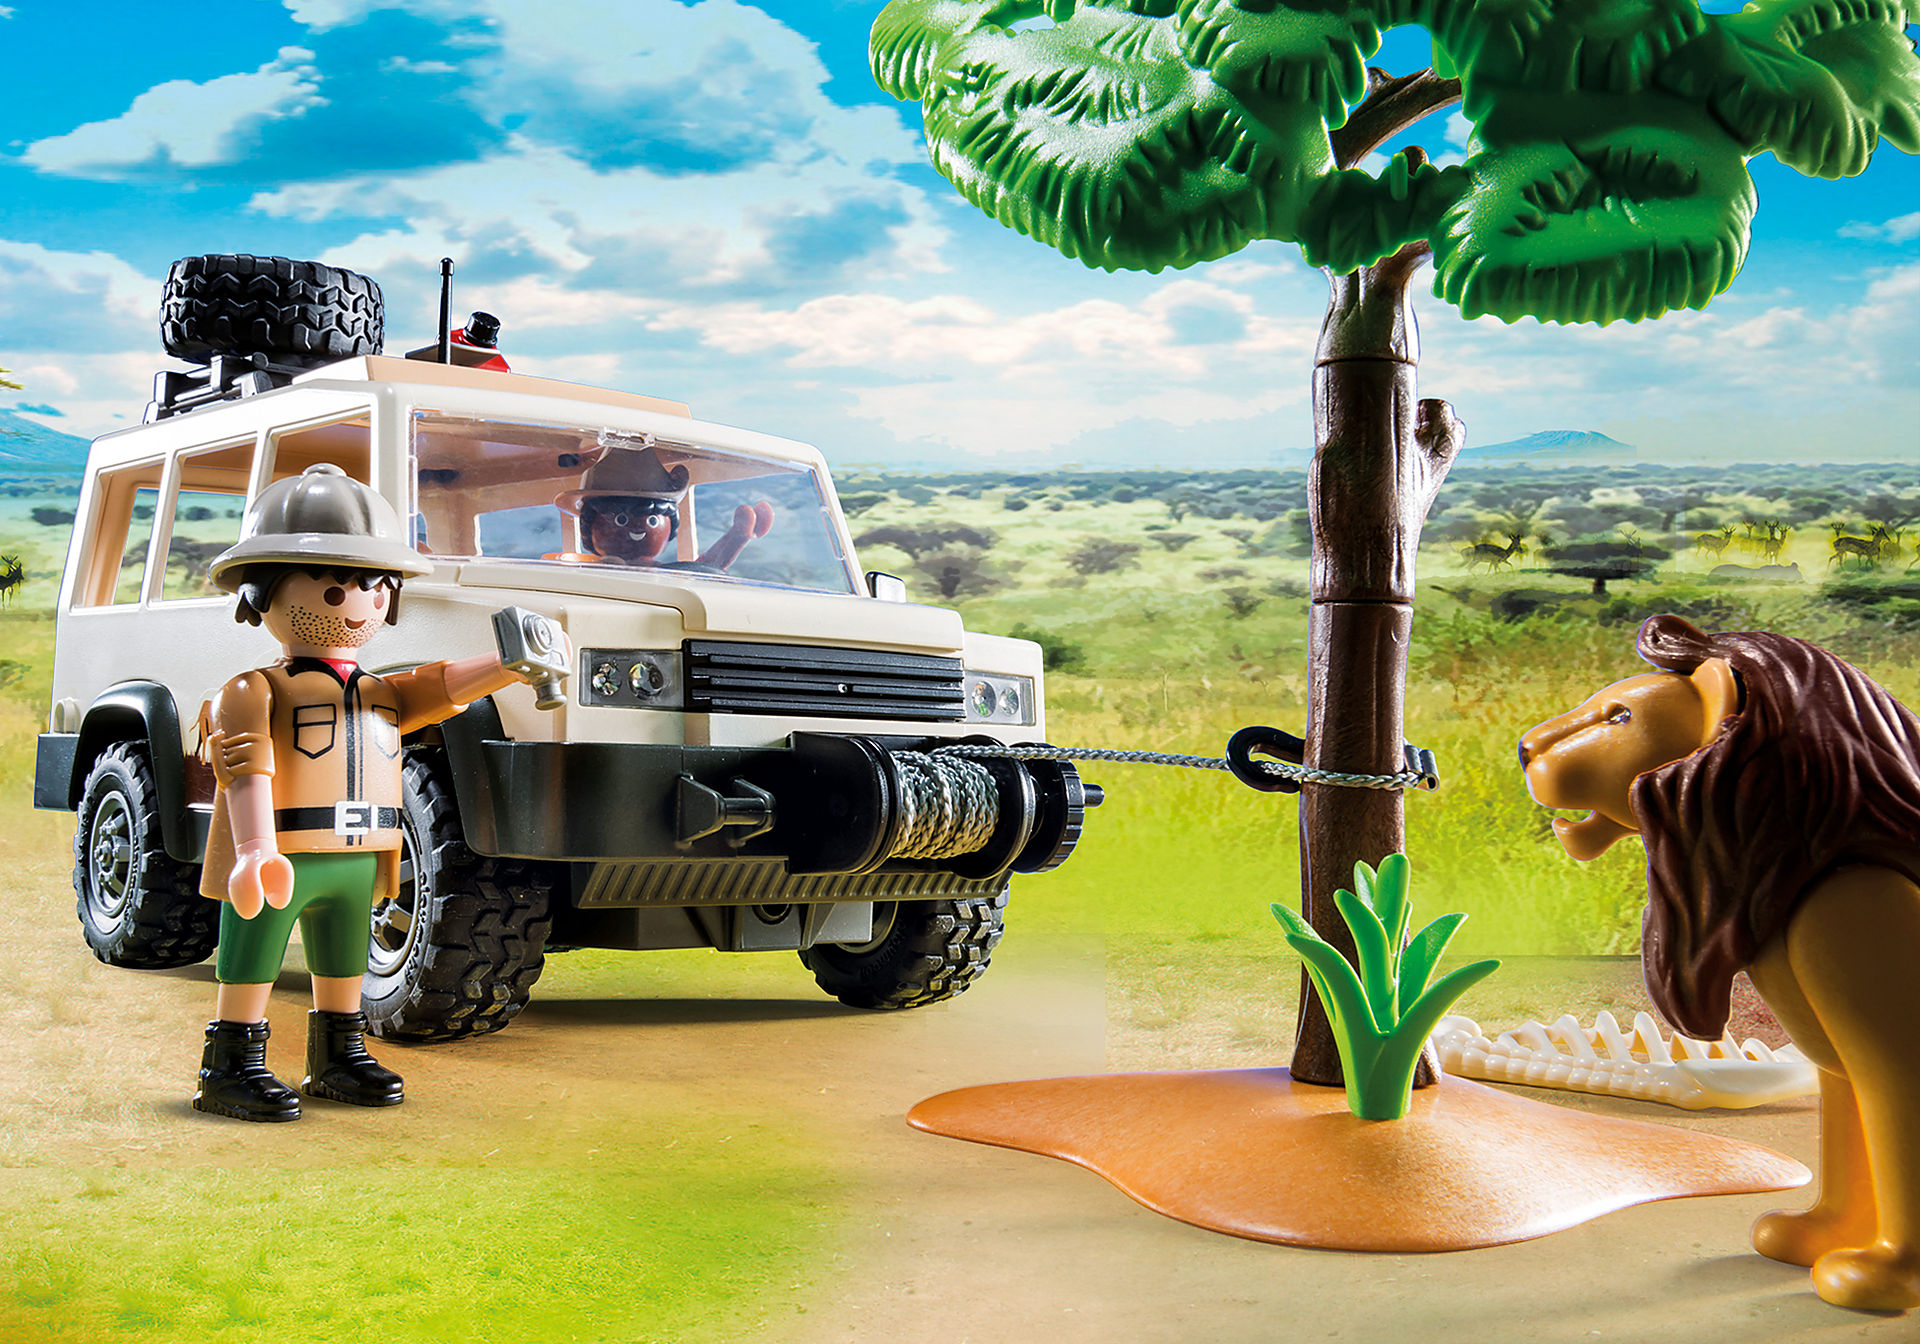 http://media.playmobil.com/i/playmobil/6798_product_extra1/Vehículo Safari con Leones